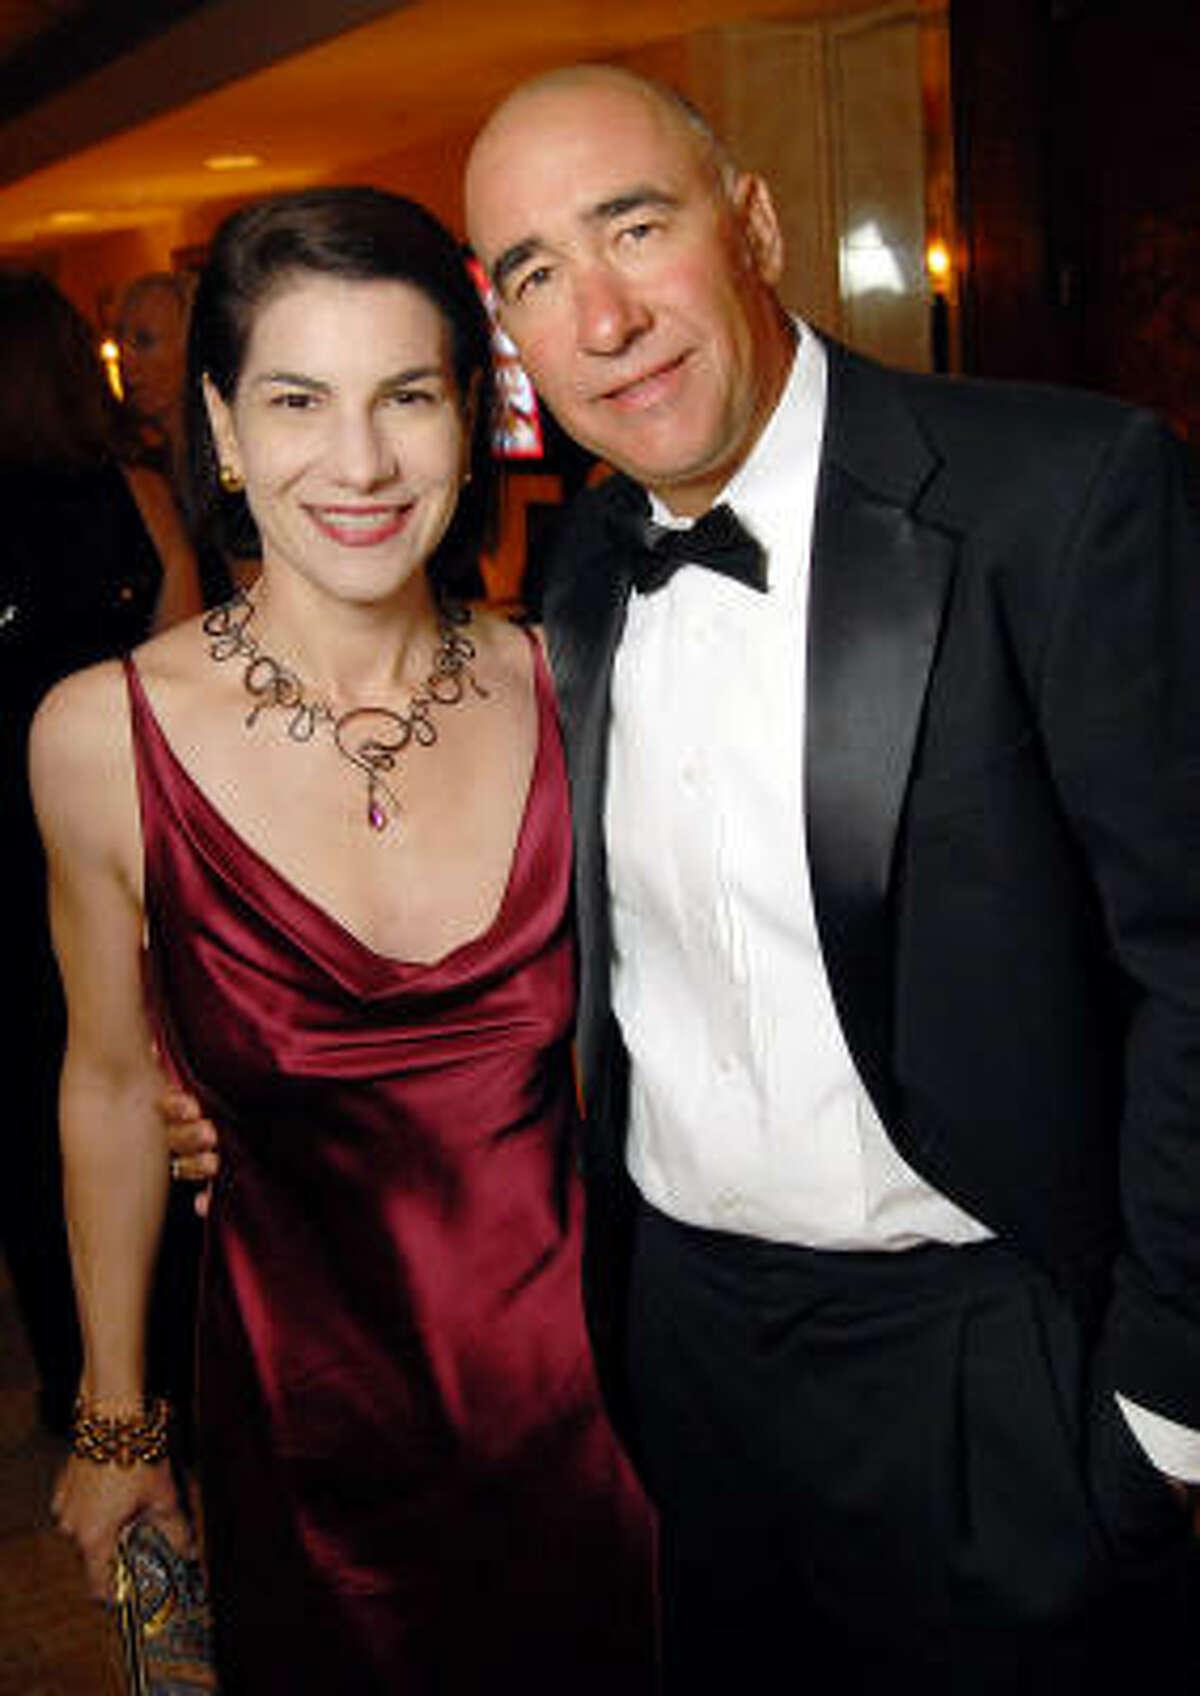 Sara Sant'Ambrogio and Brian Hoffner